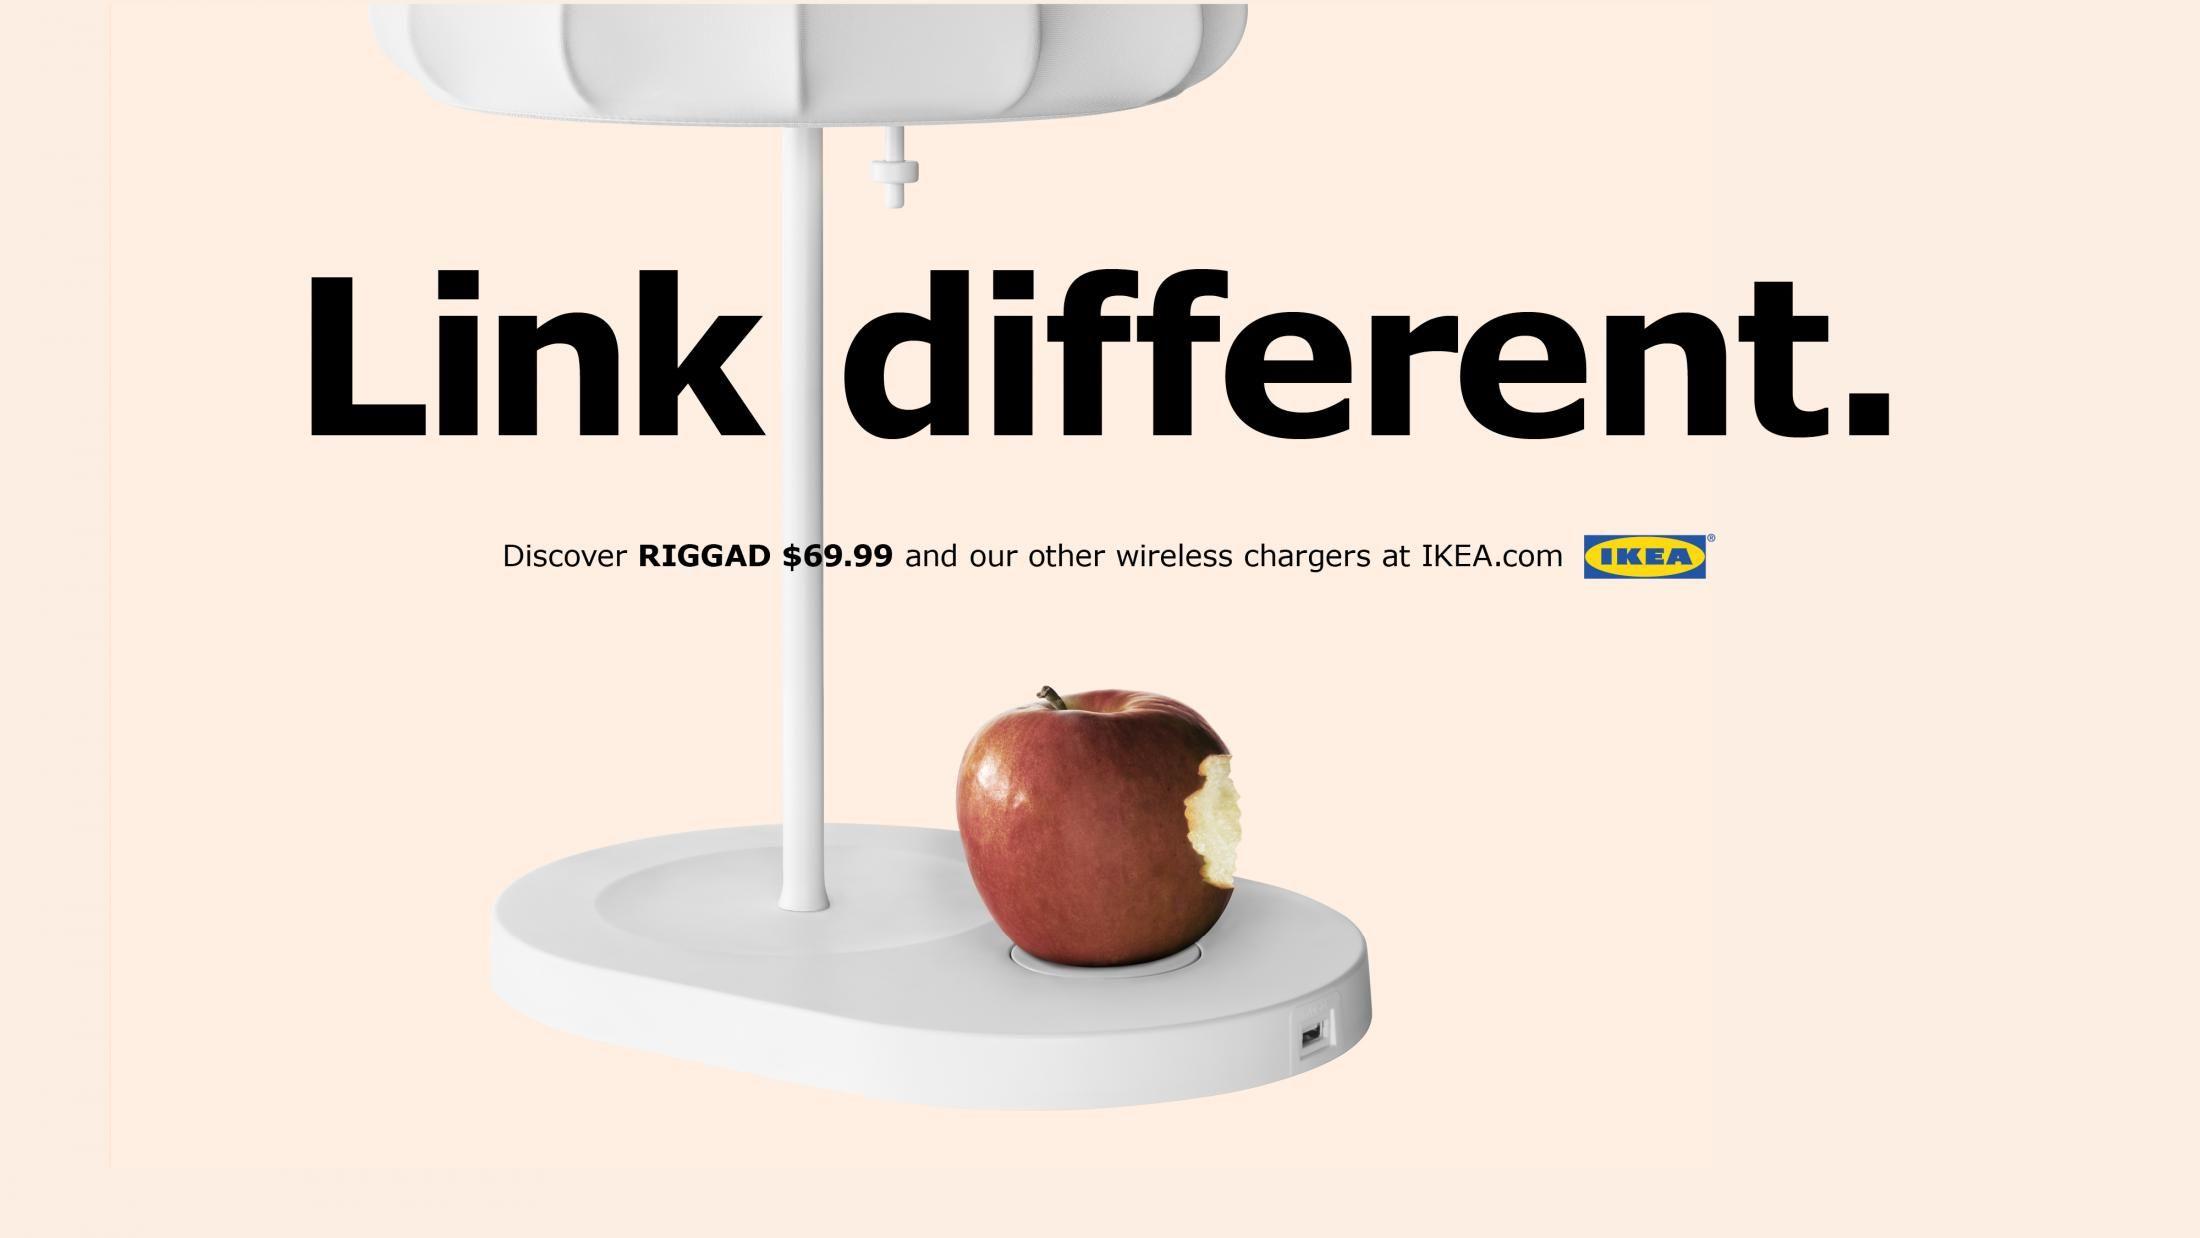 Campagne Ik A Matew S Inspiring Designs Pinterest Ik A Et  # Ikea Annonce Publicite